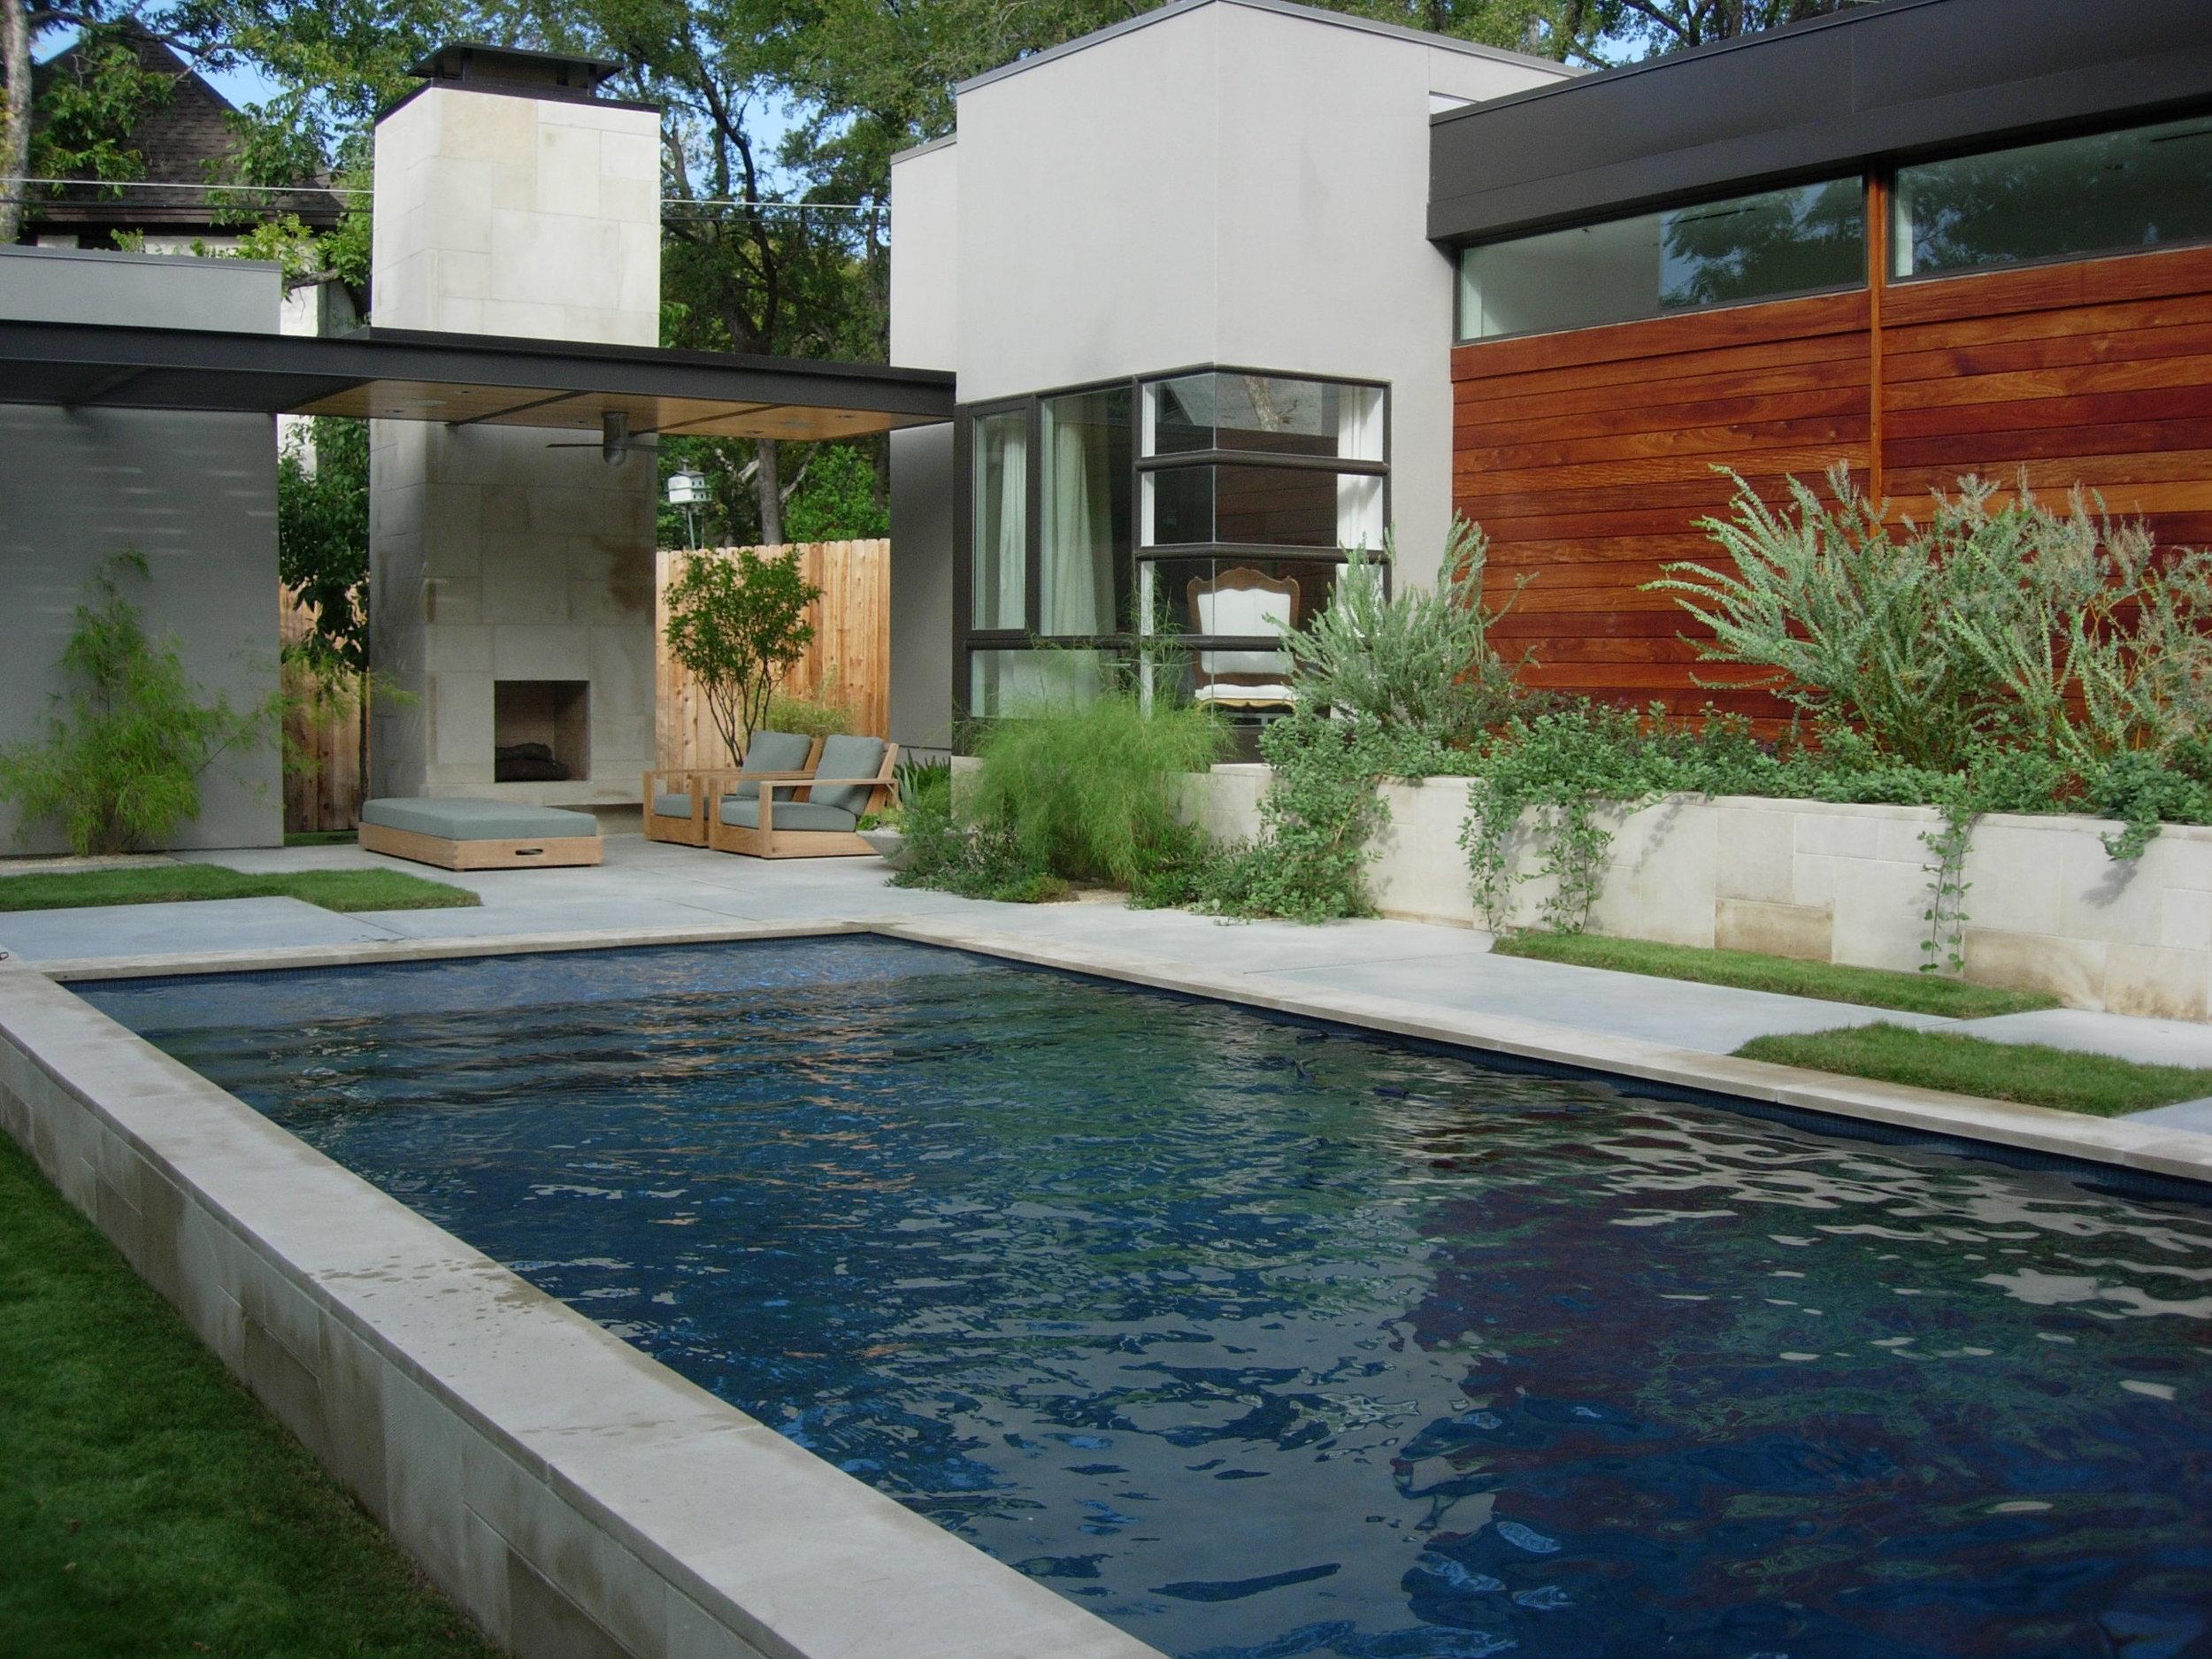 project-verde-vista-pool-Download 2006 October 1 108.jpg